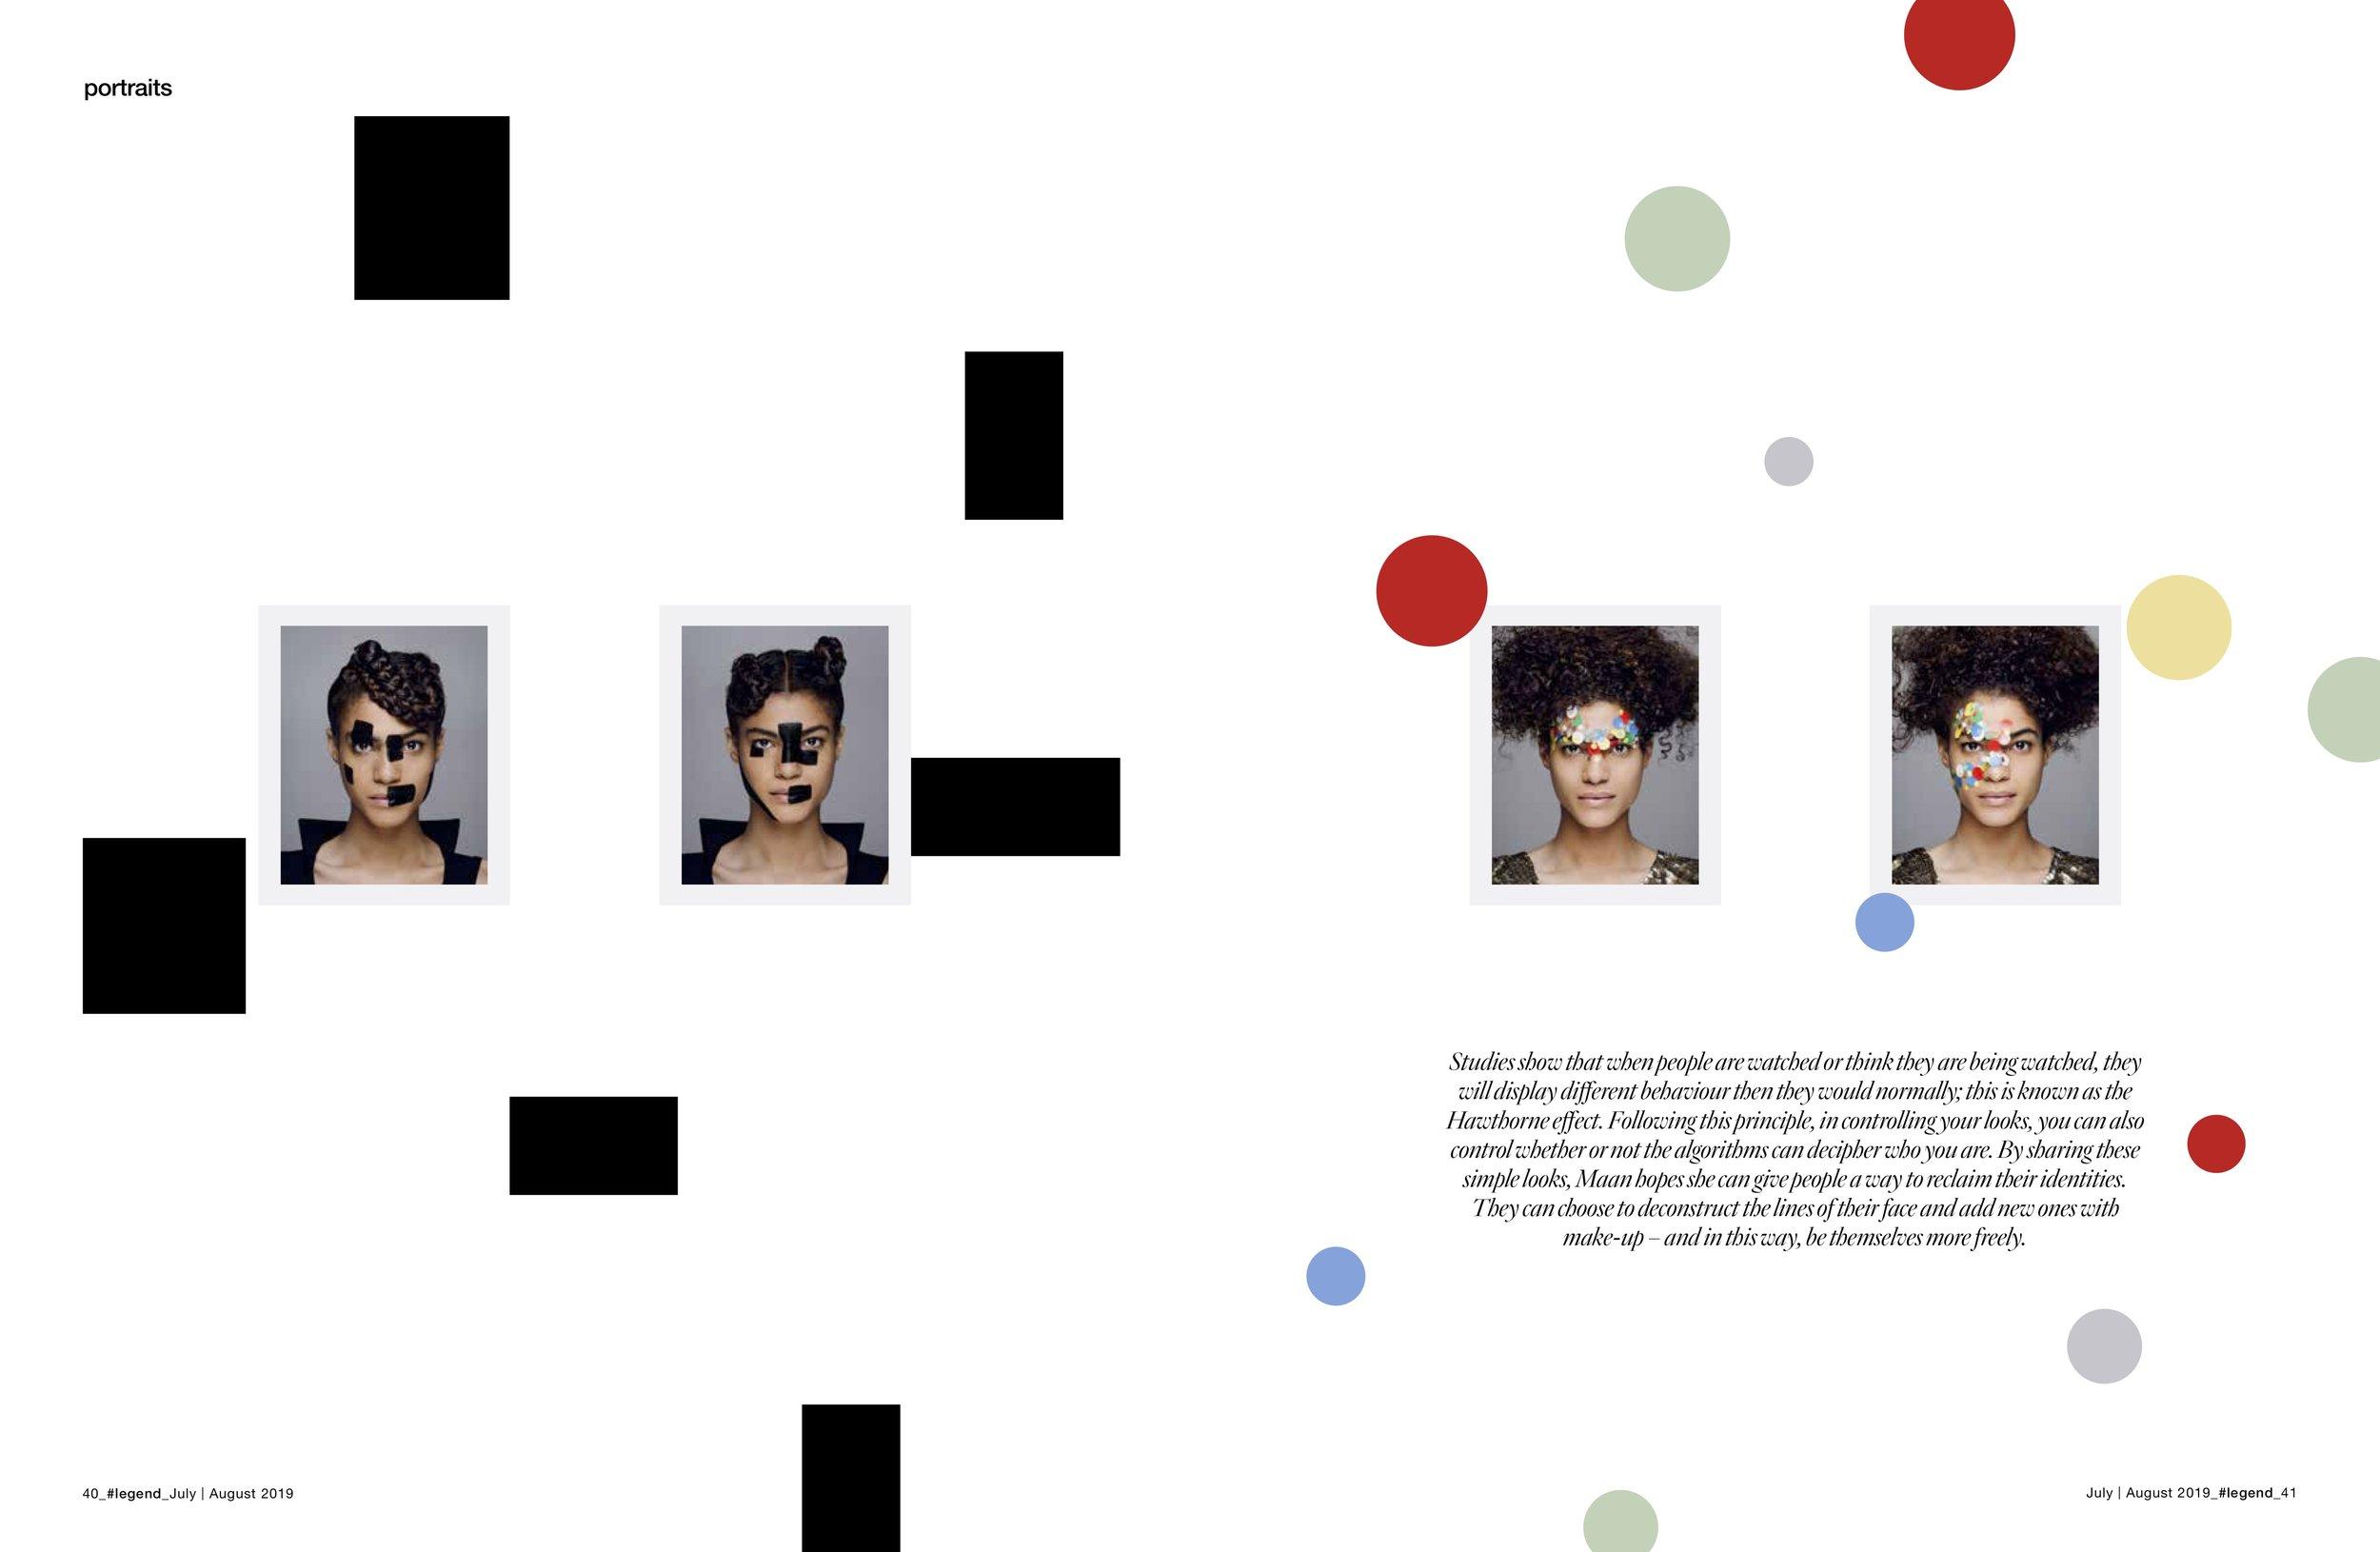 16_JUL_AUG_038-041_Portraits_-_Escaping_Digital_Identity_jb-4ppx.jpg